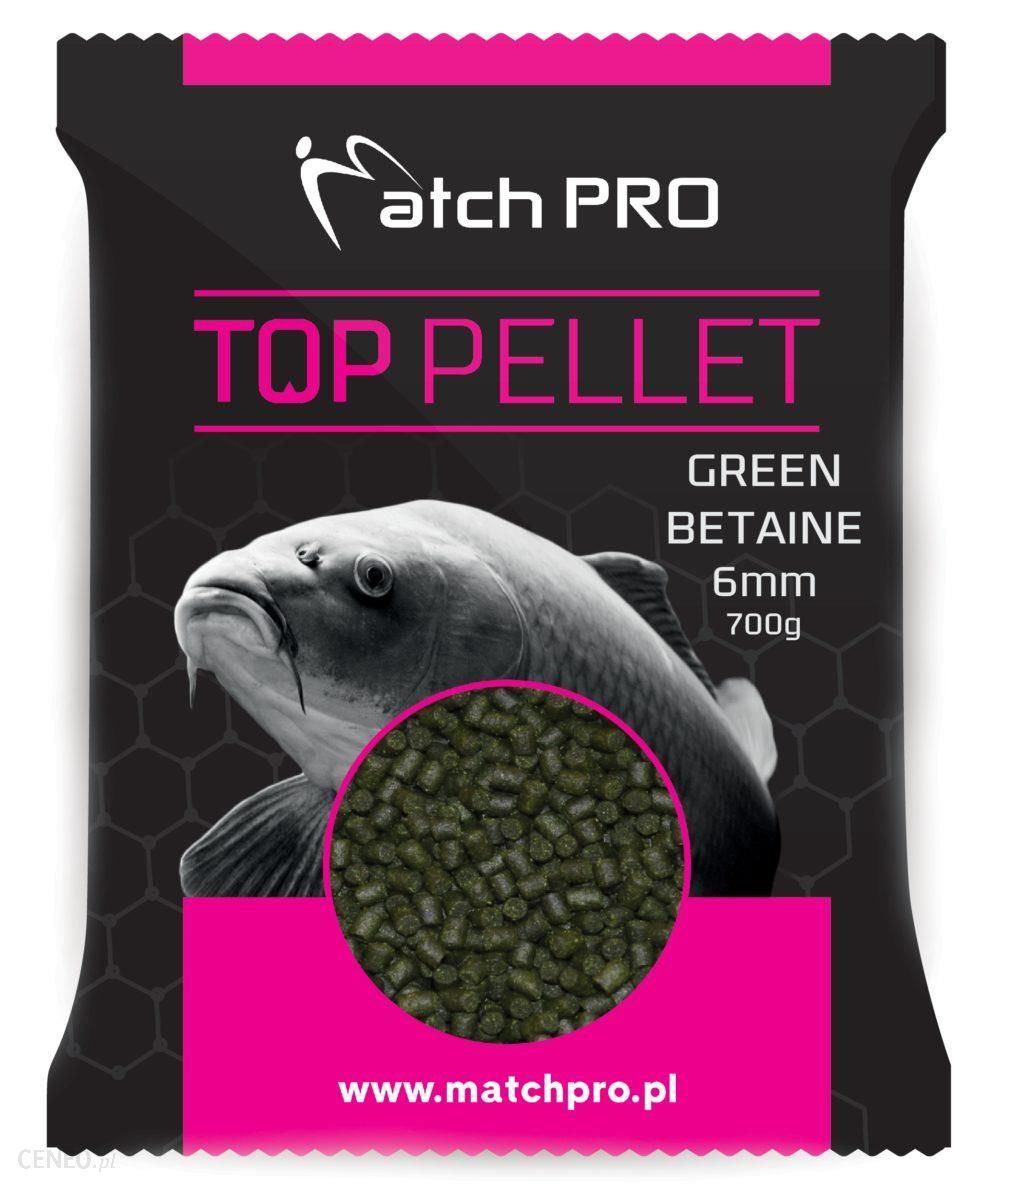 Matchpro Green Betaine 6Mm Pellet 700G